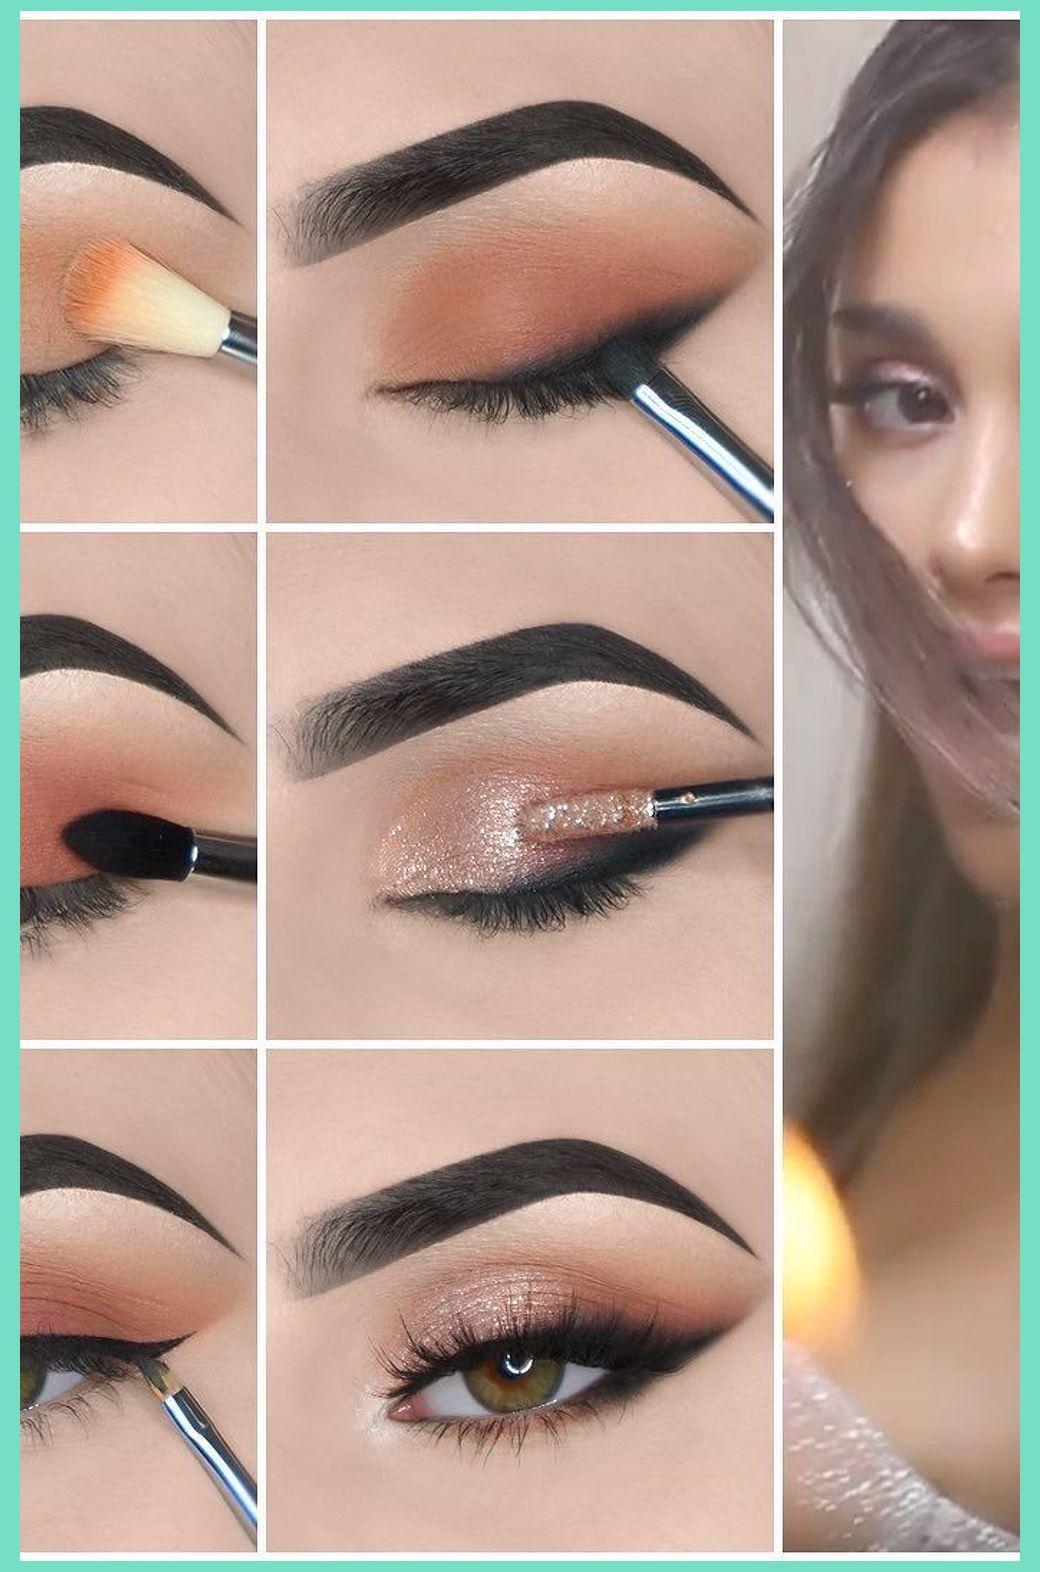 3 benefits you can get from using natural makeup natural